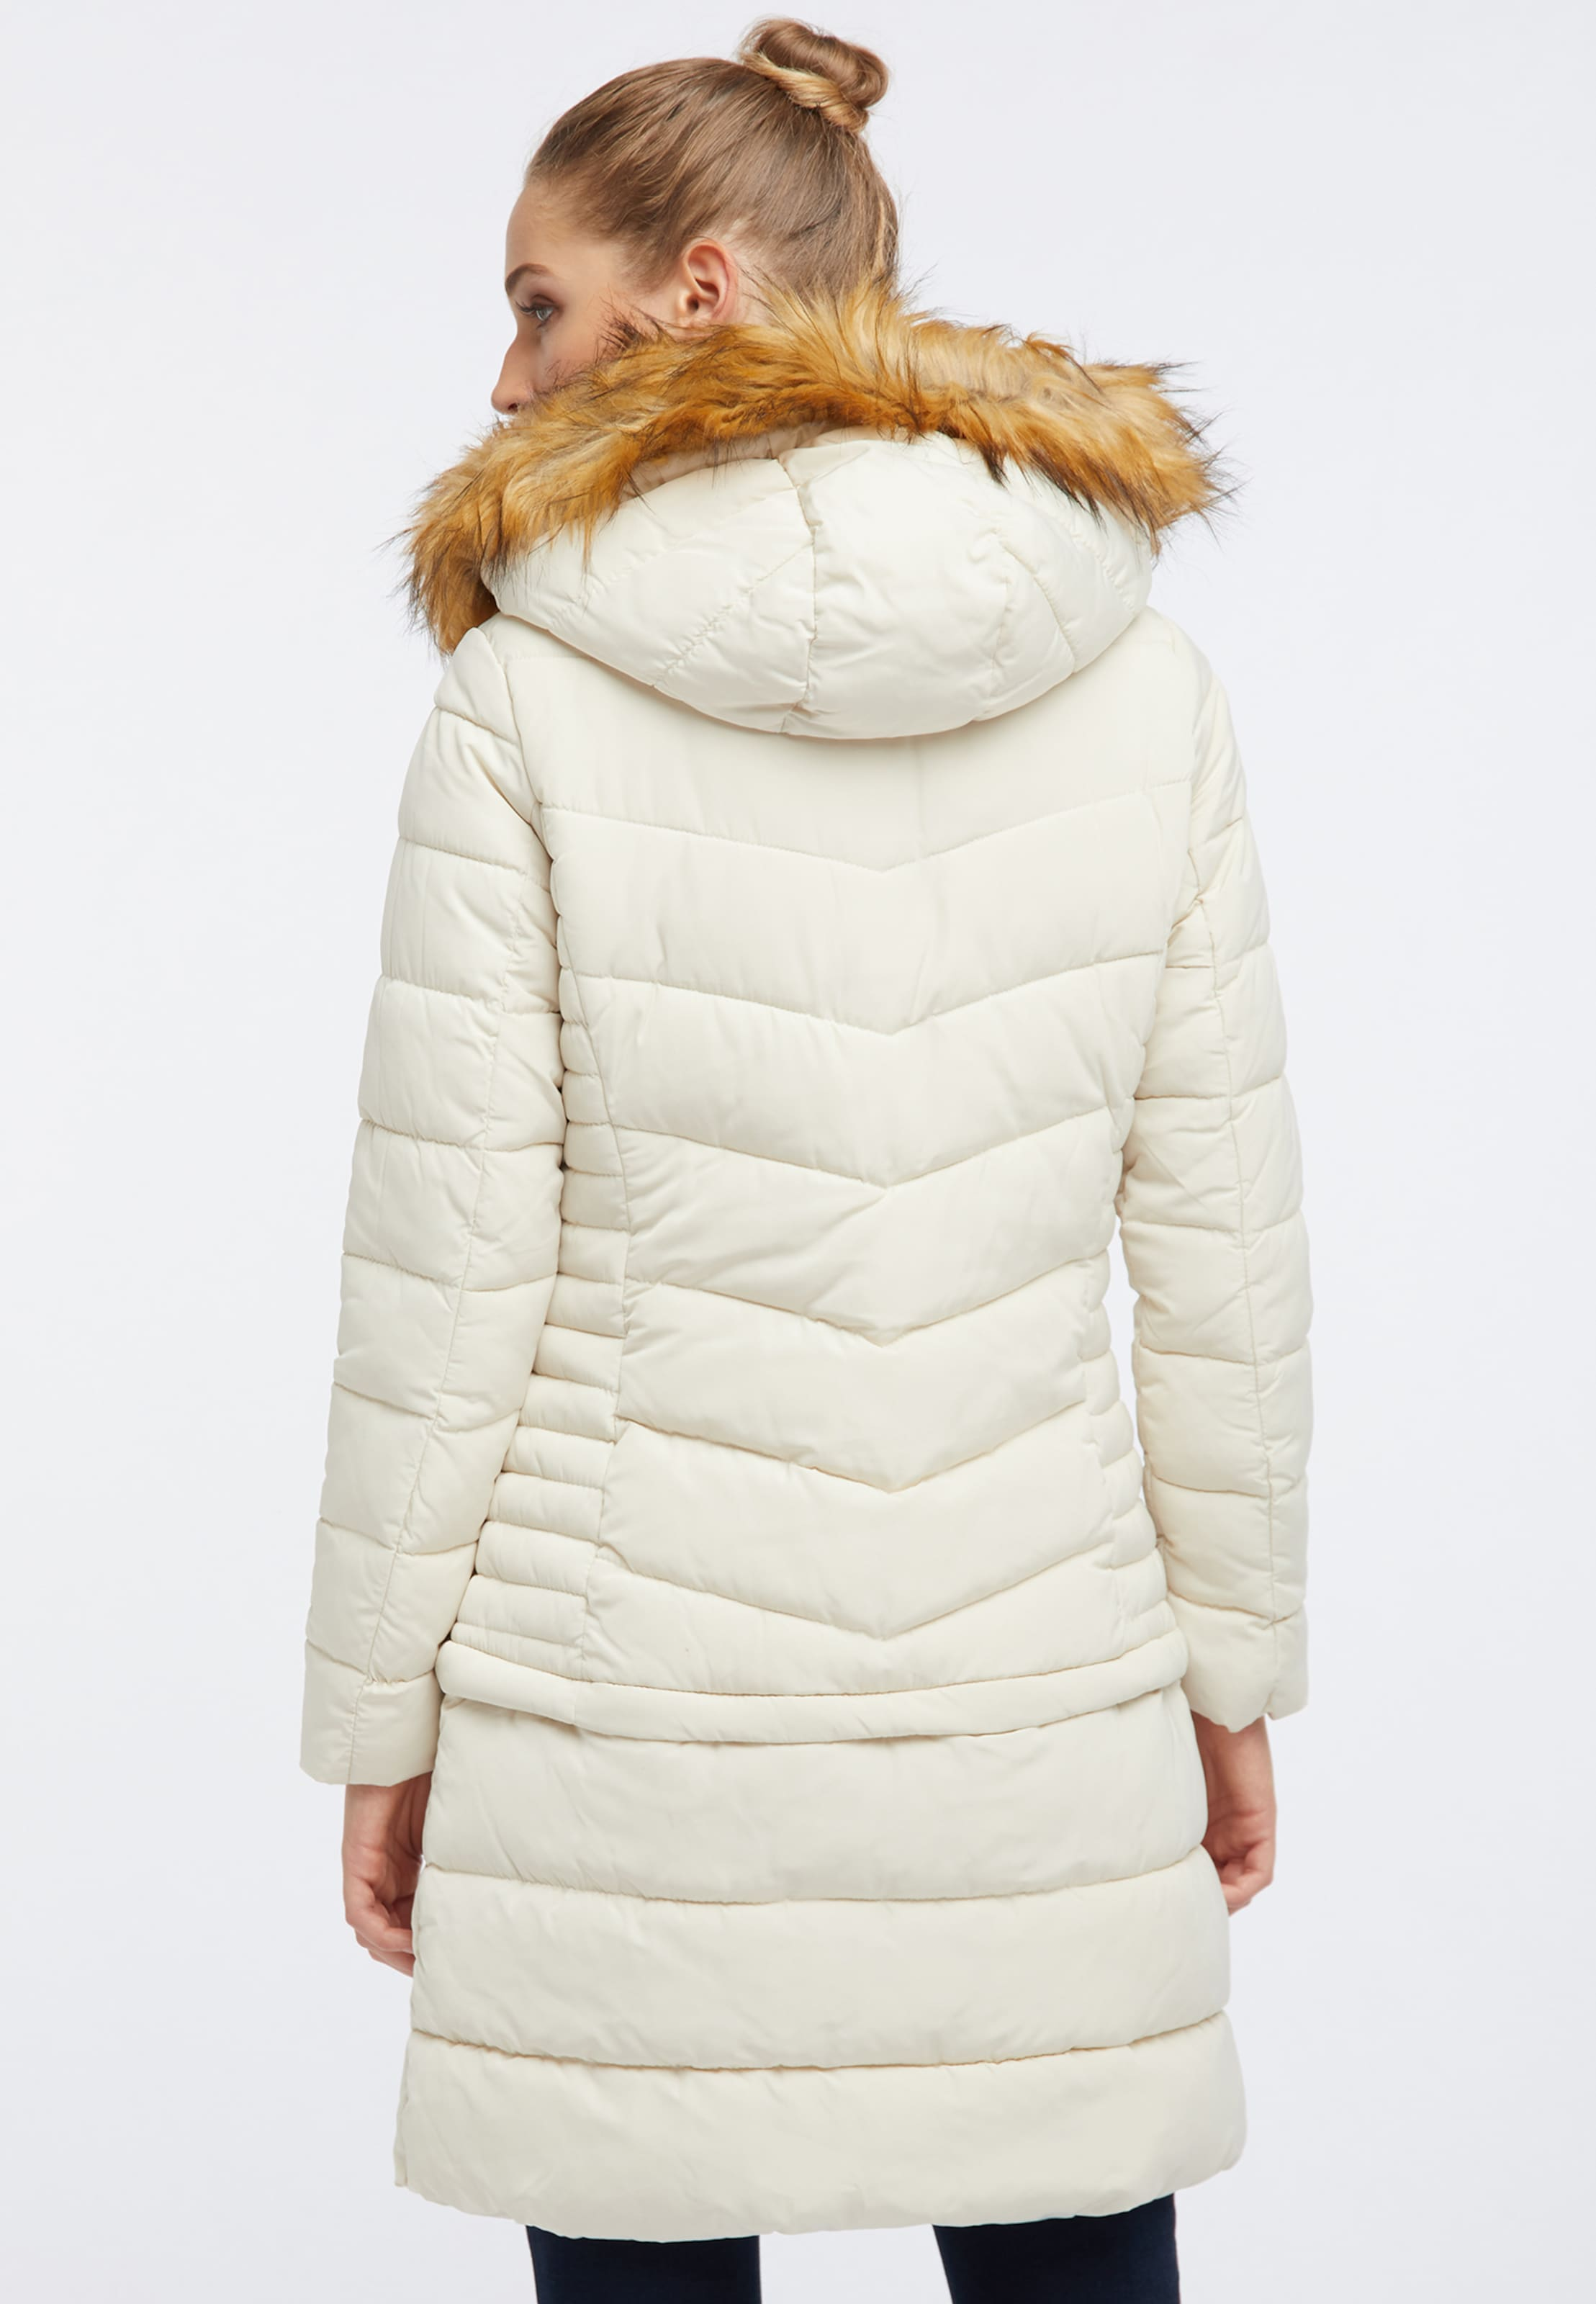 Blanc En Usha Parka D'hiver Cassé Ifgb7Yv6y